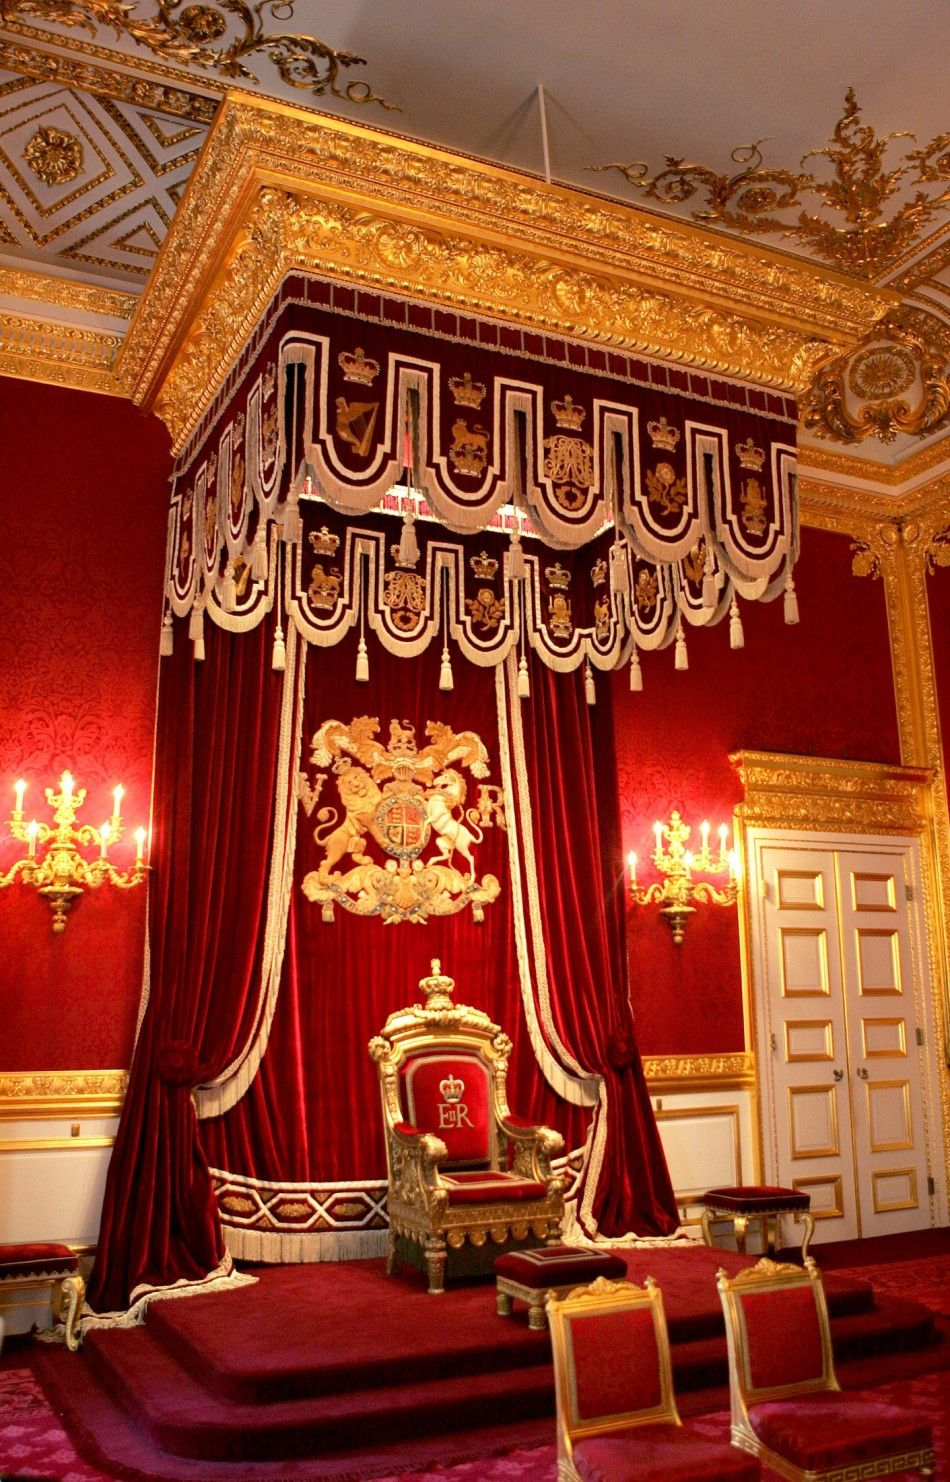 Throne room buckingham palace - Inside Buckingham Palace Queens Room At Buckingham Palace Throne Room